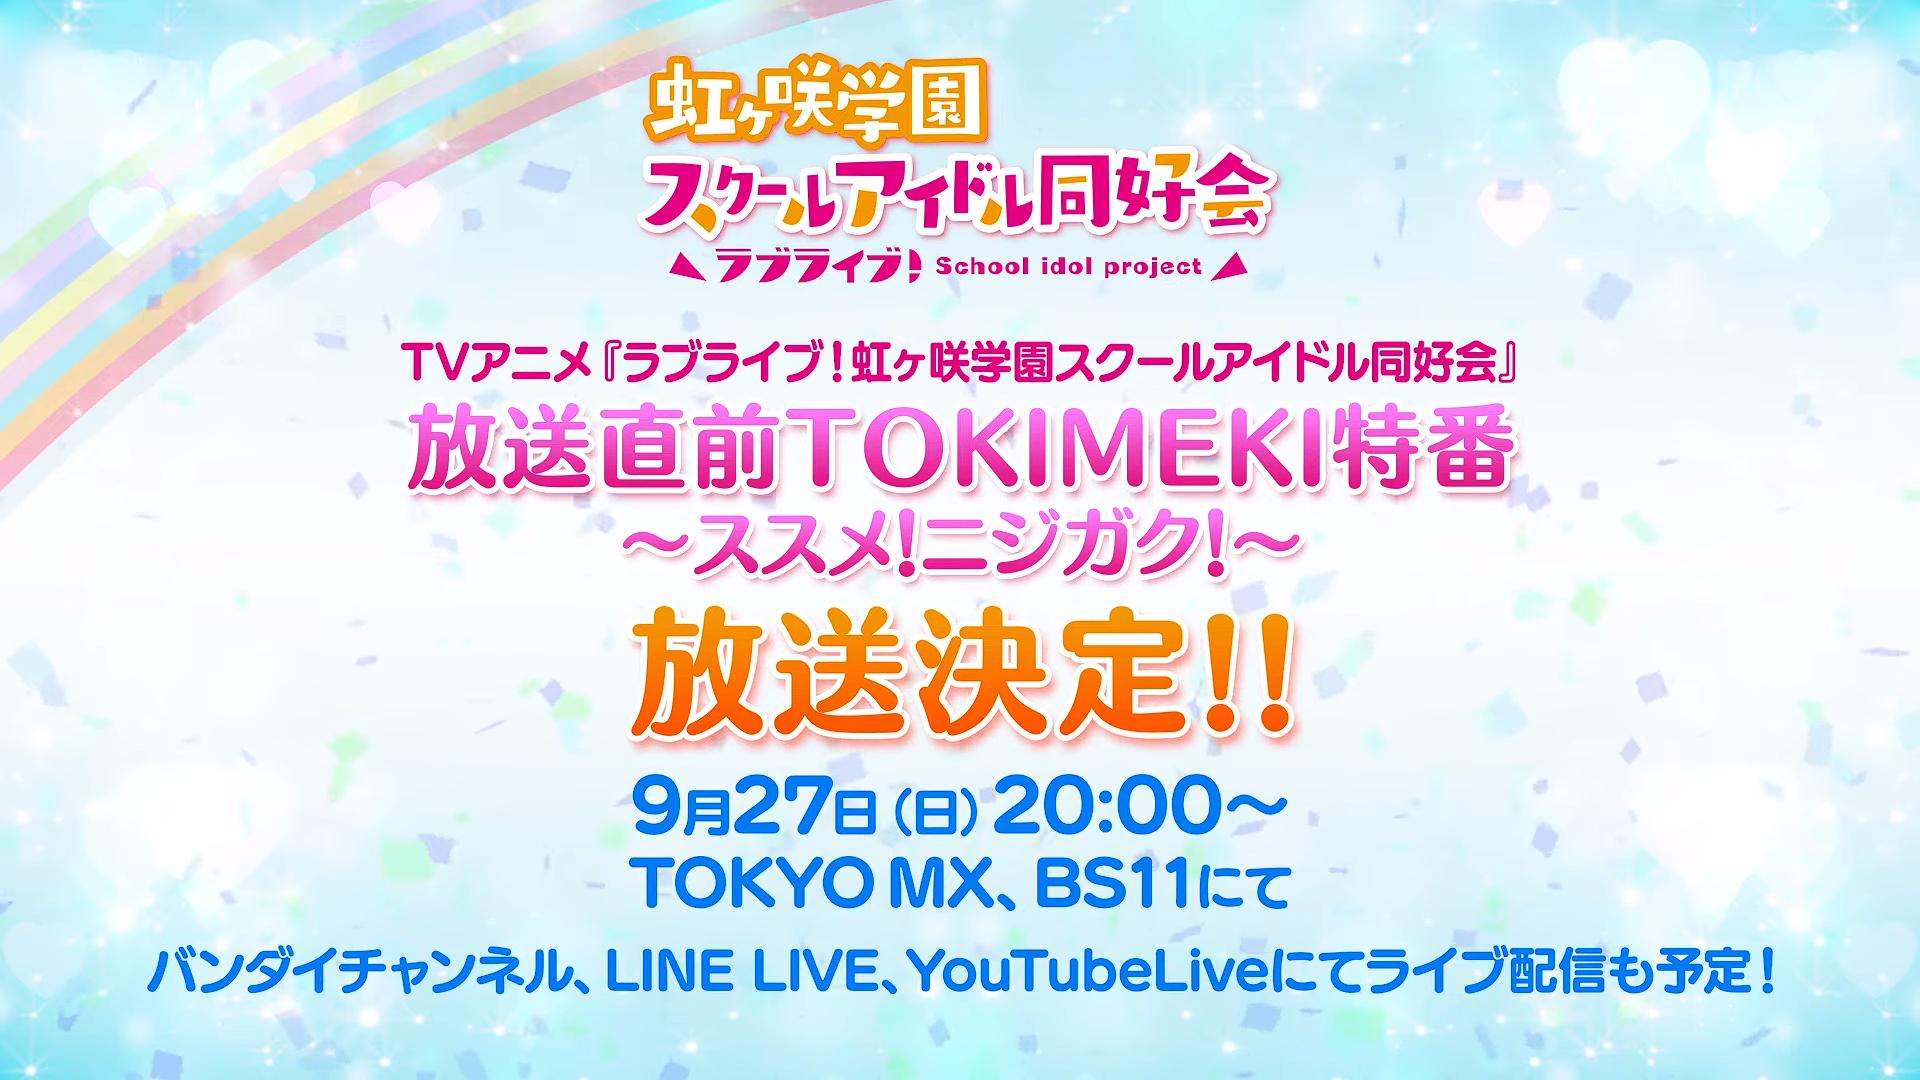 《LoveLive!虹咲学园学园偶像同好会》发布宣传视频及海报,即将开播